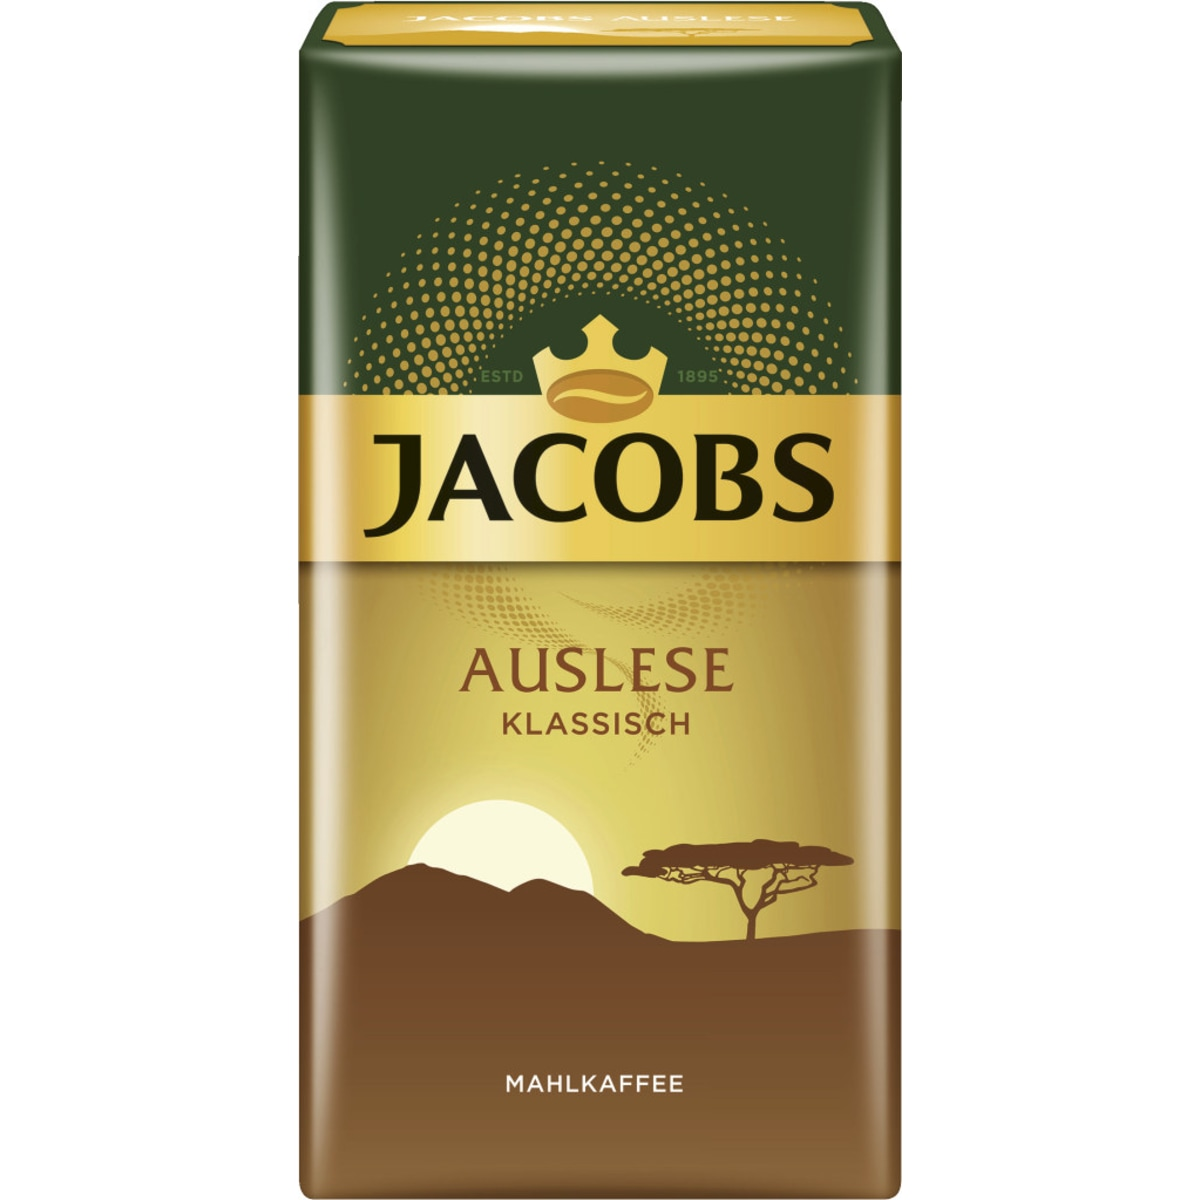 Jacobs Auslese Classic gemahlen